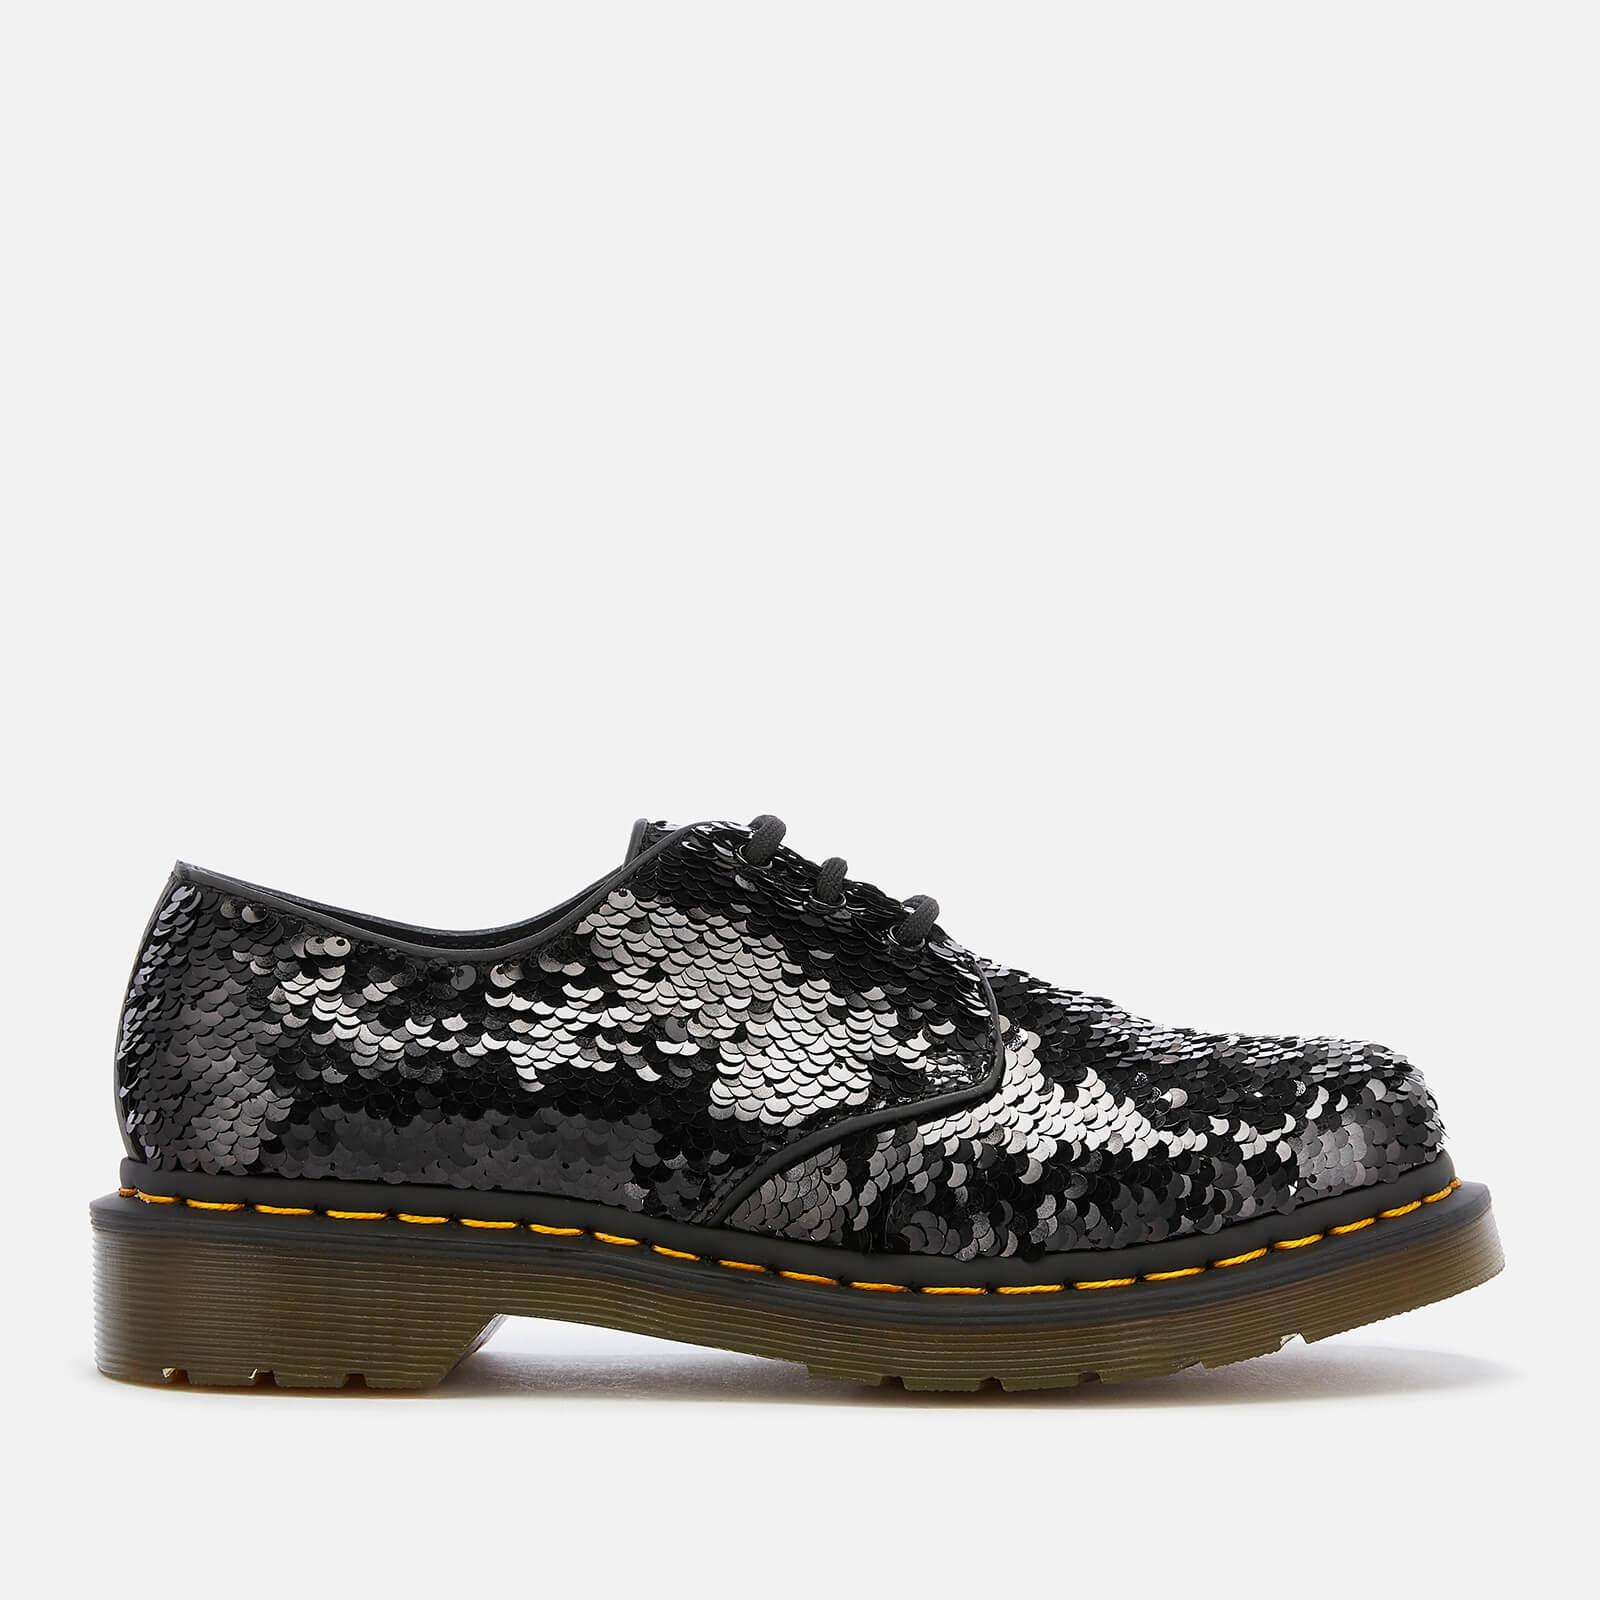 Dr. Martens Women's 1461 Sequin 3-Eye Shoes - Black/Silver - UK 3 - Black